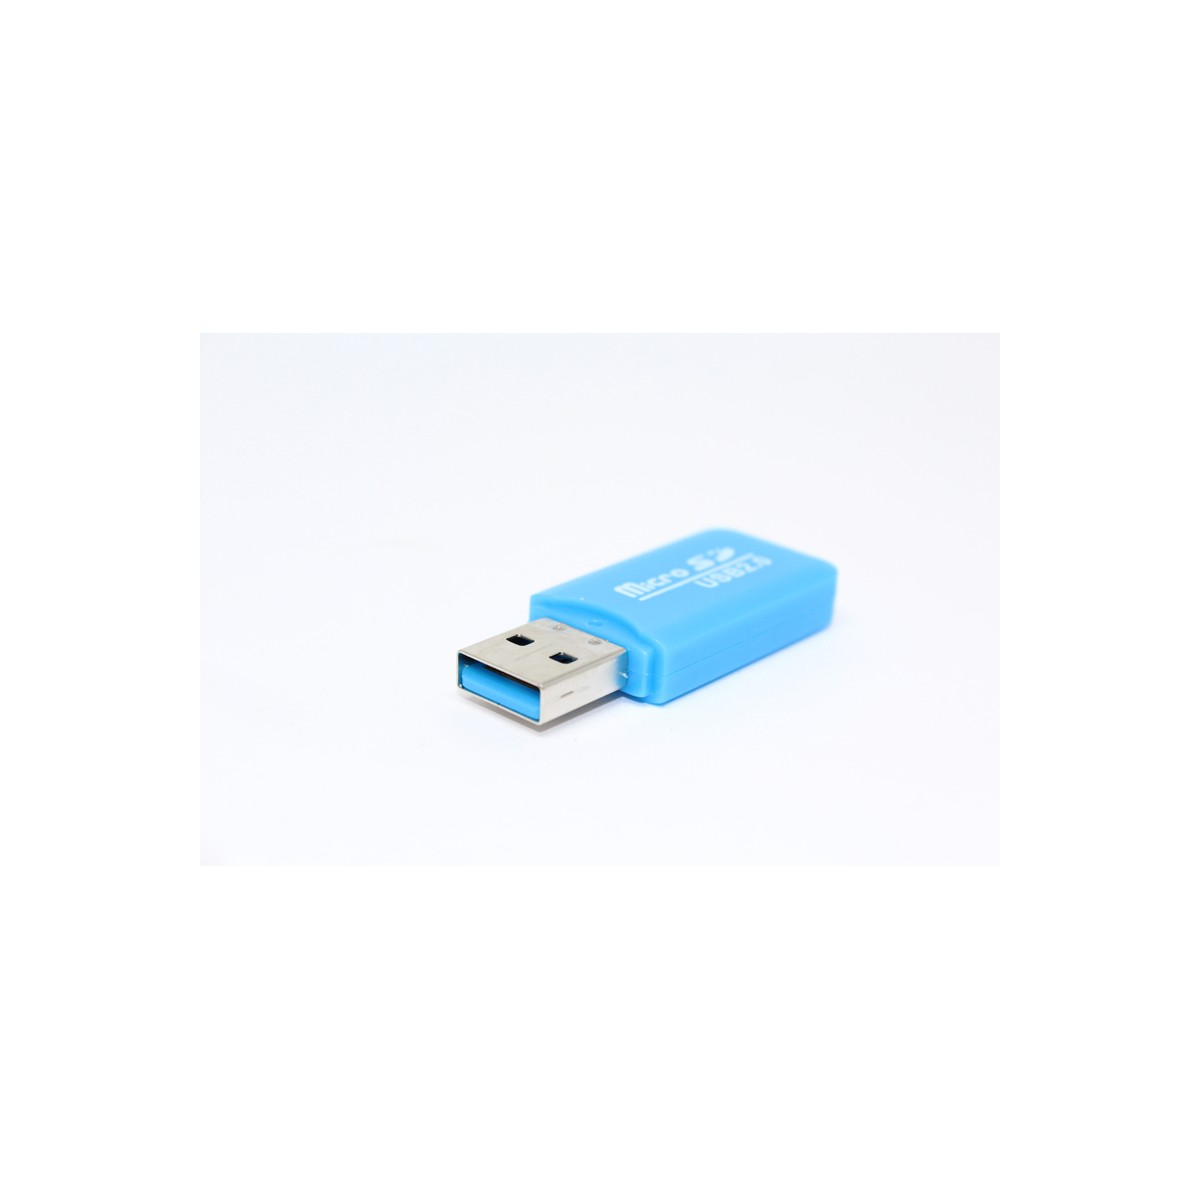 USB 2.0 Micro SD Card Reader